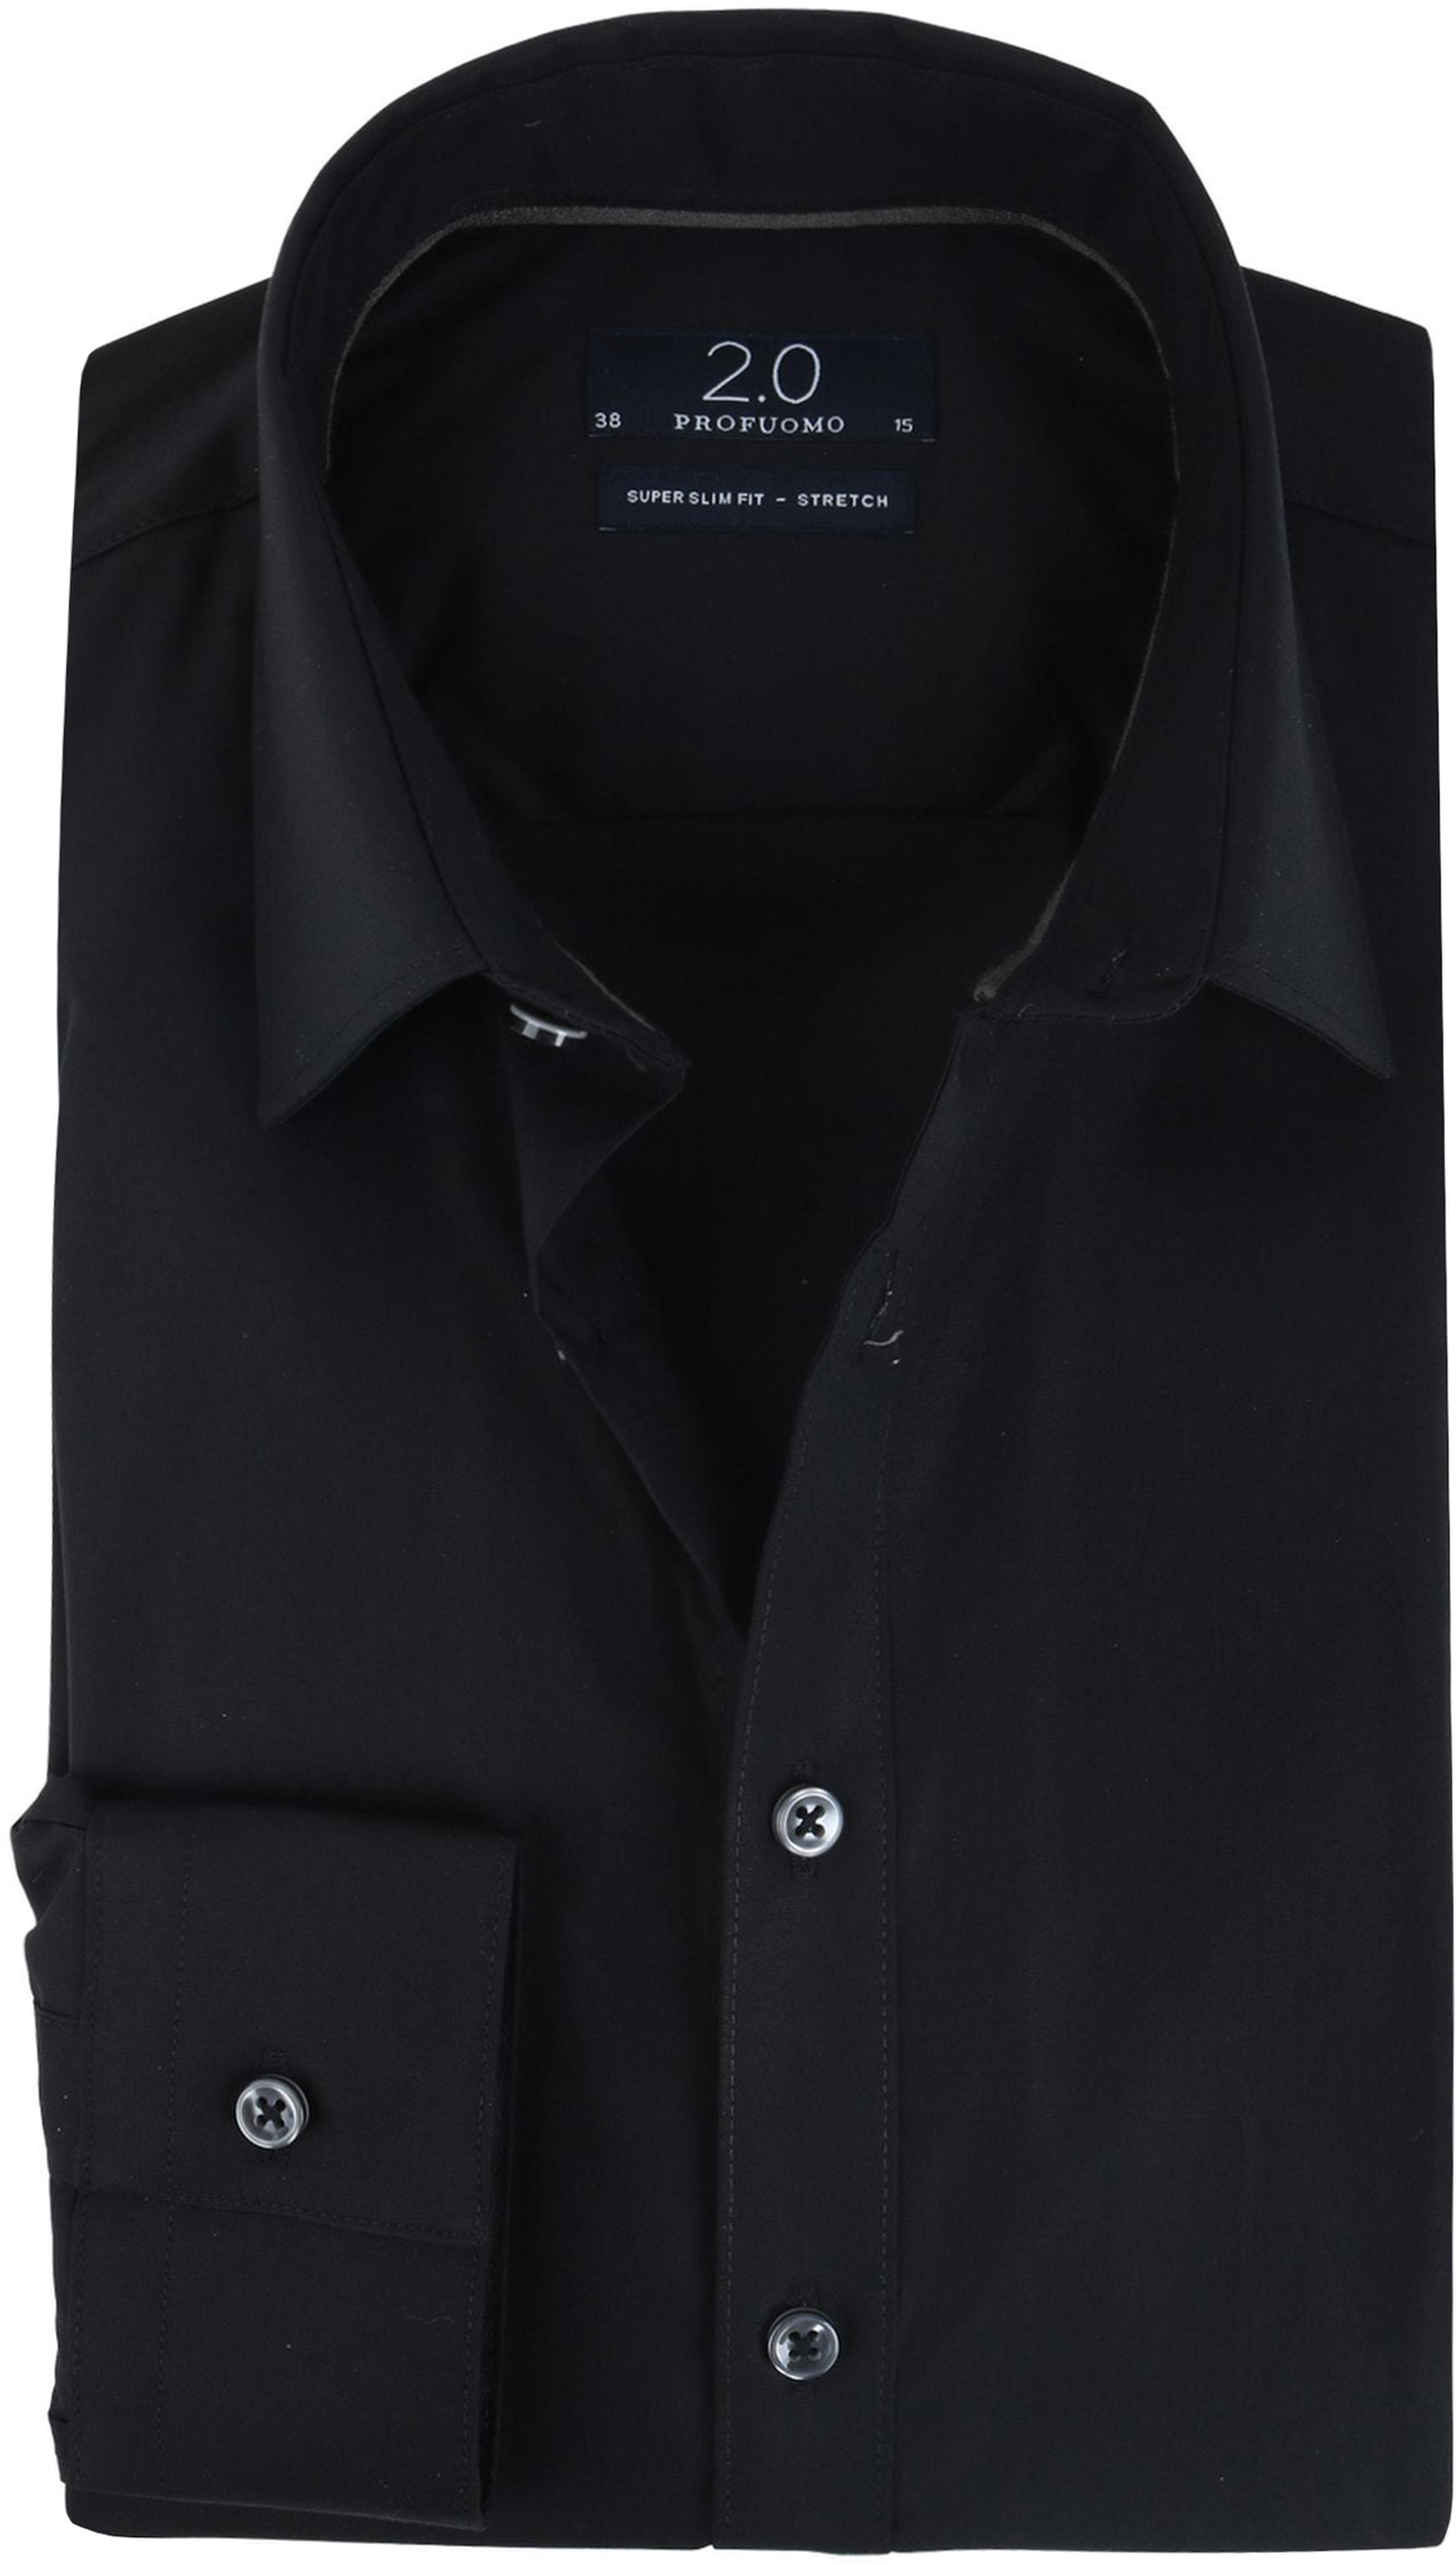 Overhemd Zwart Slim Fit.Profuomo Skinny Fit Overhemd Zwart Pp0h0d004